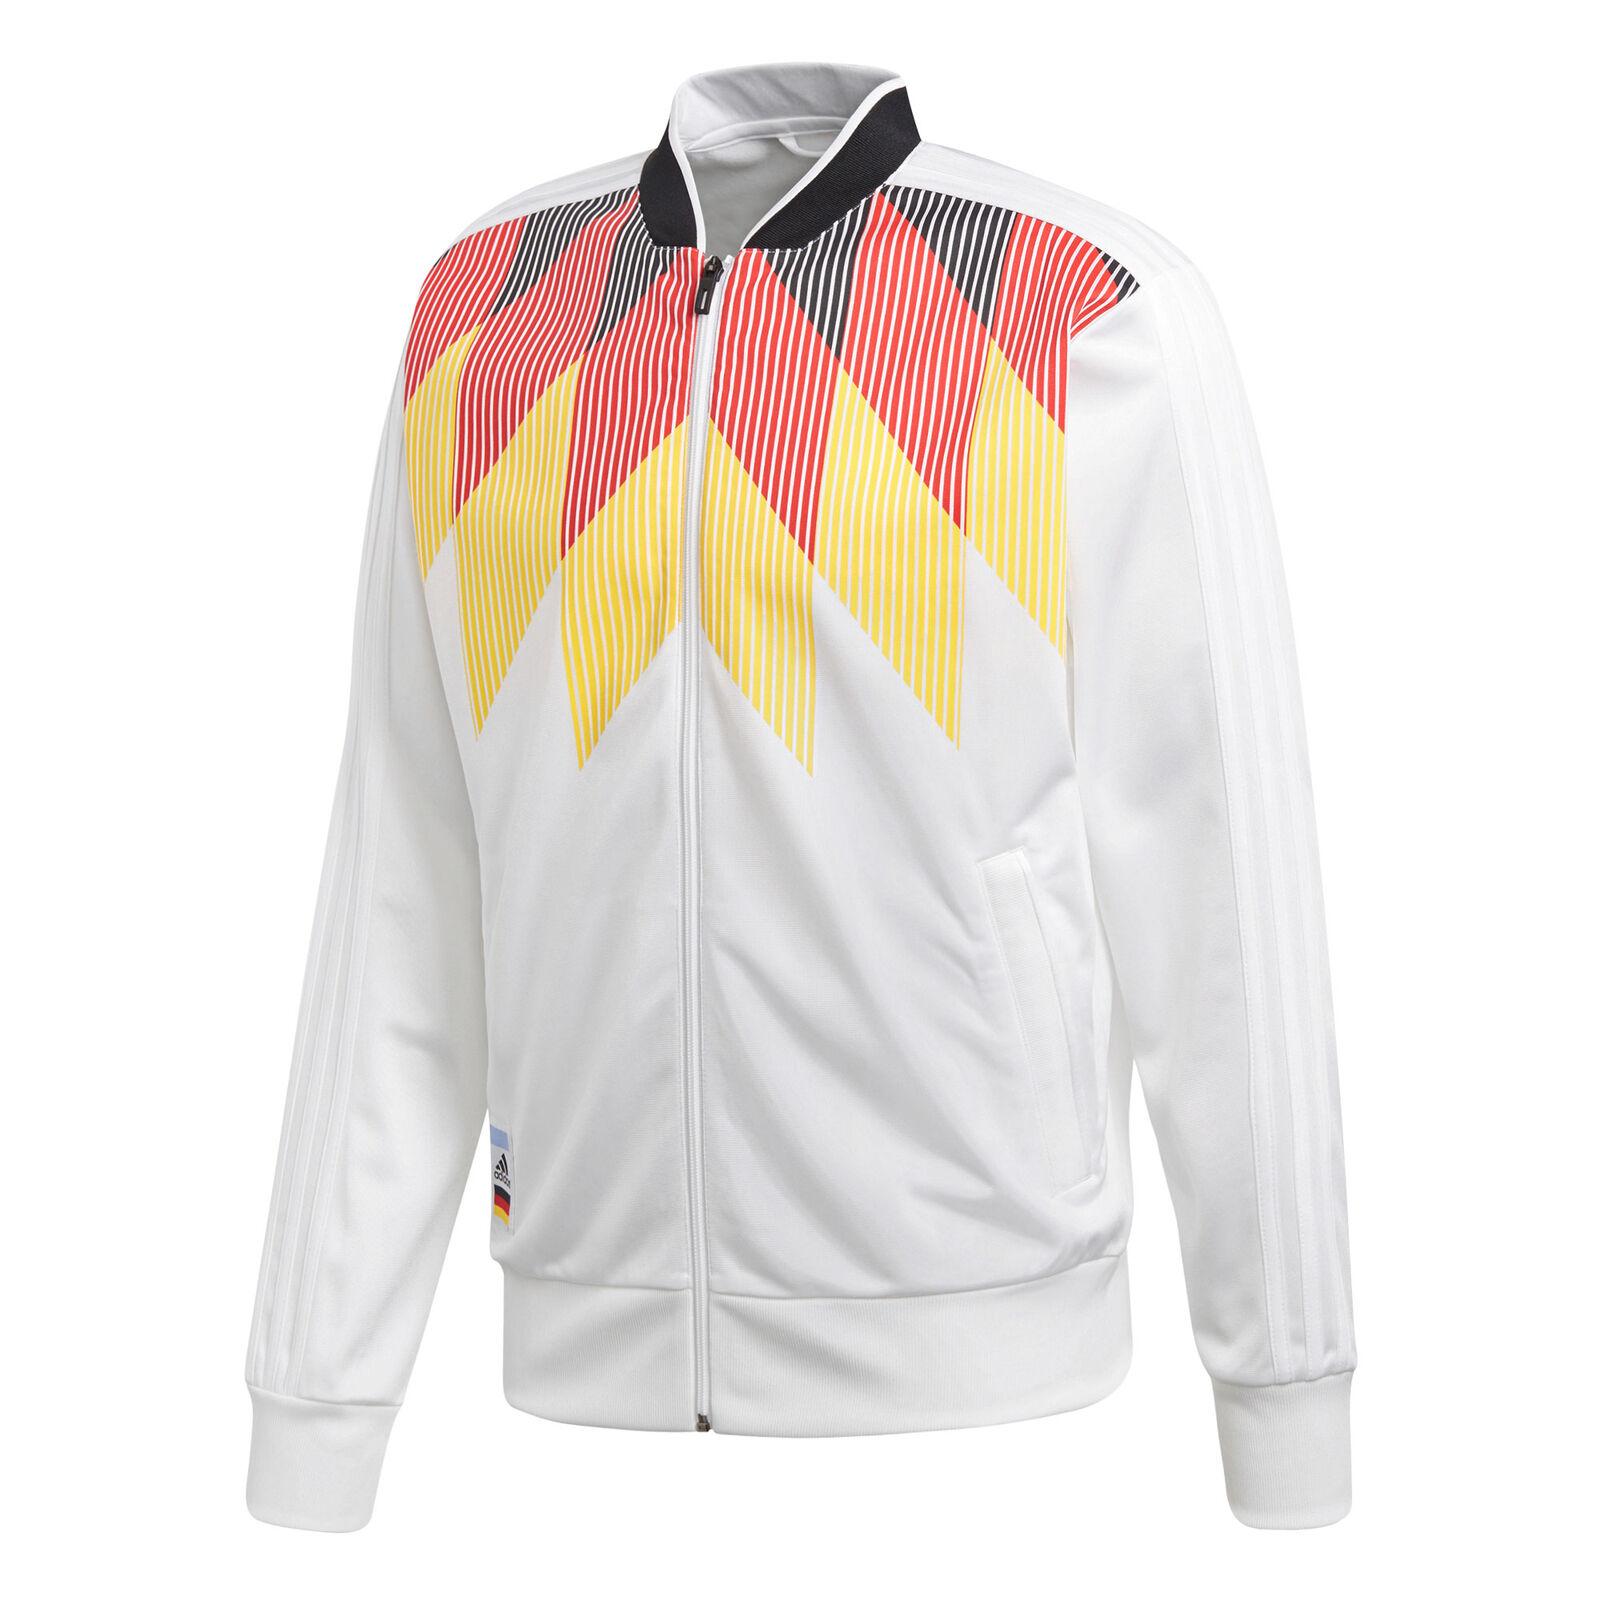 Adidas Deutschland Ci Track Jacke Sportjacke Fußballjacke Fußballjacke Fußballjacke Fußball Herren 13a4d7